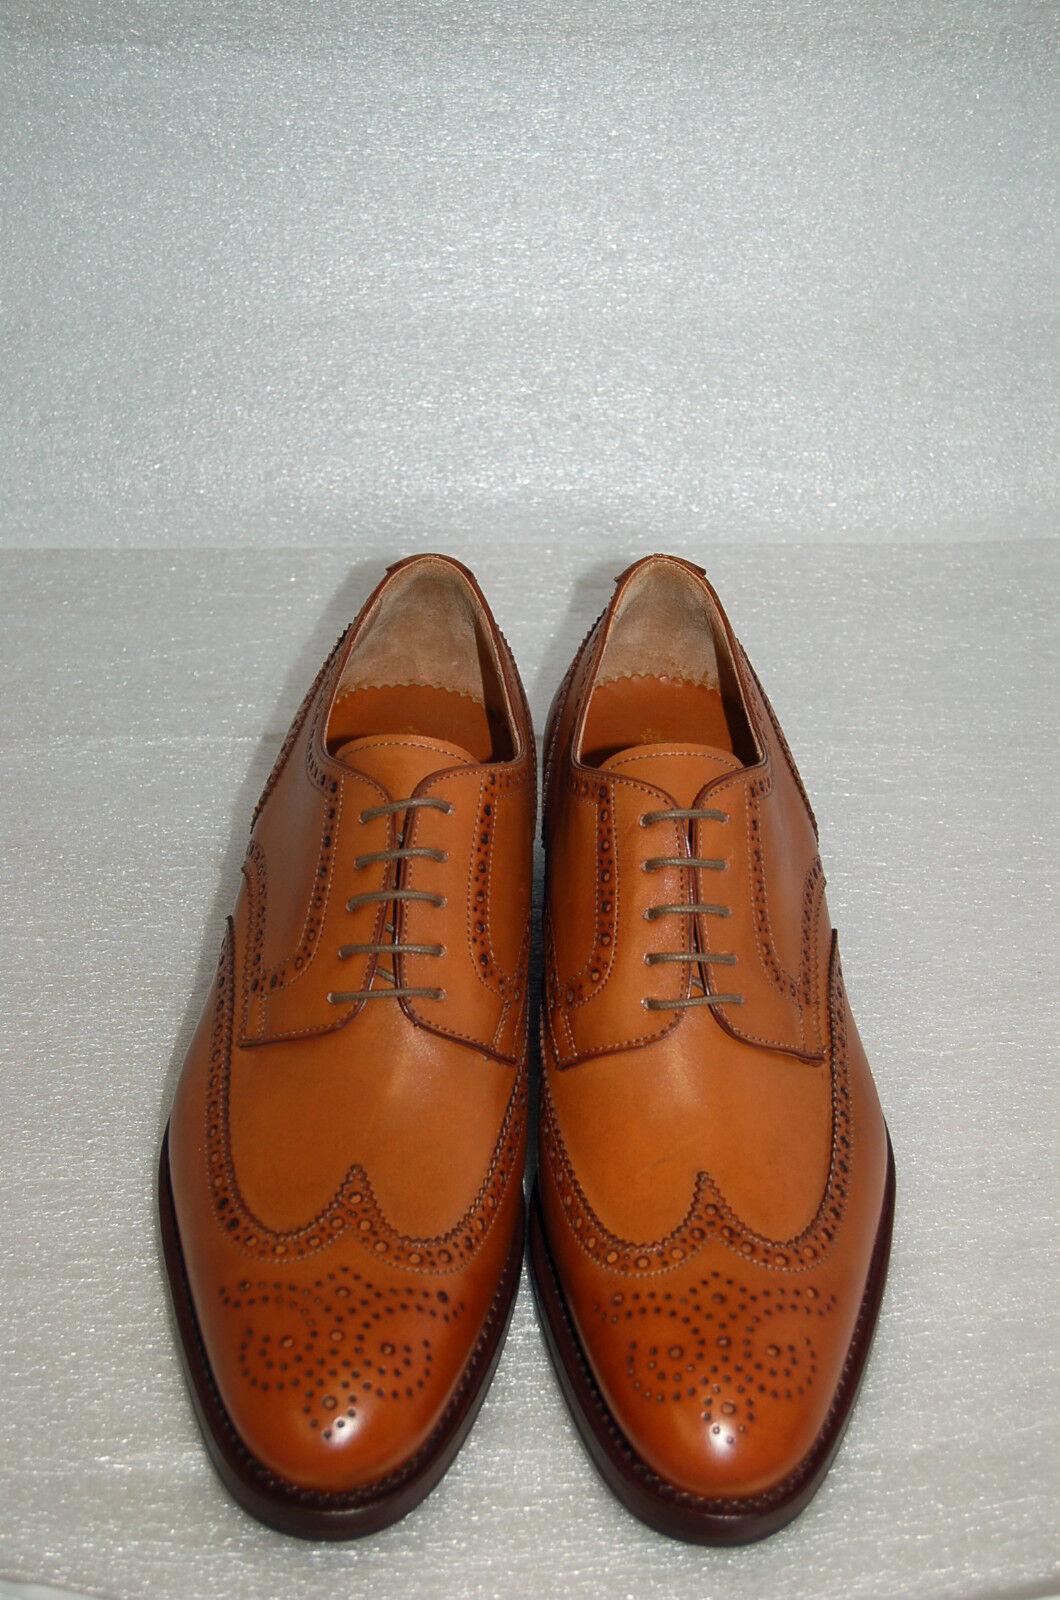 outlet in vendita MAN MAN MAN -42- 8eu-OXFORD WING CAPTOE -CALF TAN- FRANCESINA CUOIO - LTH SOLE+DAINITE  qualità autentica